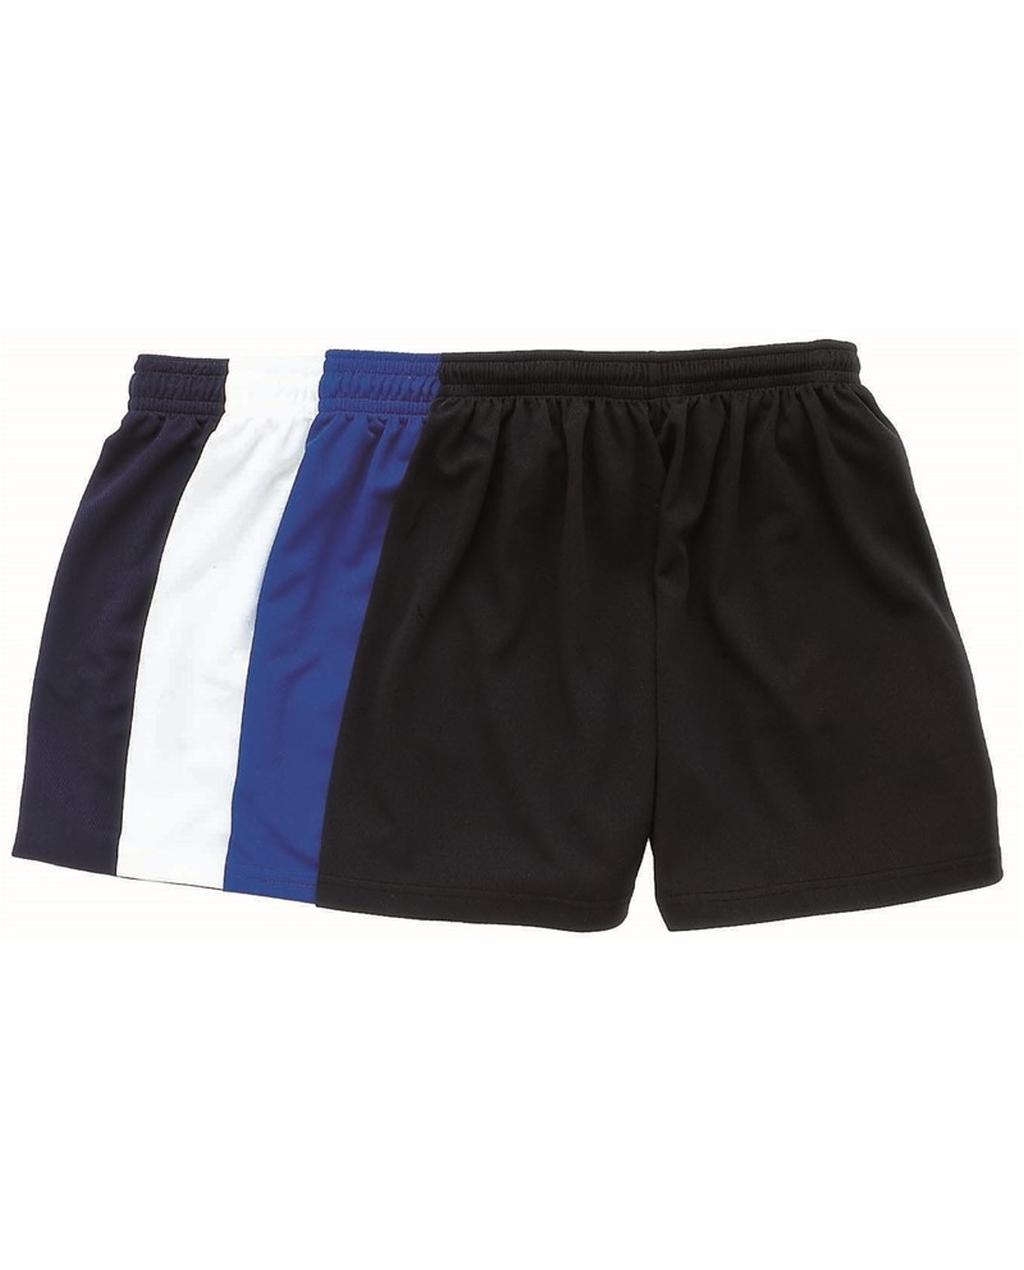 Football Shorts - 28/30